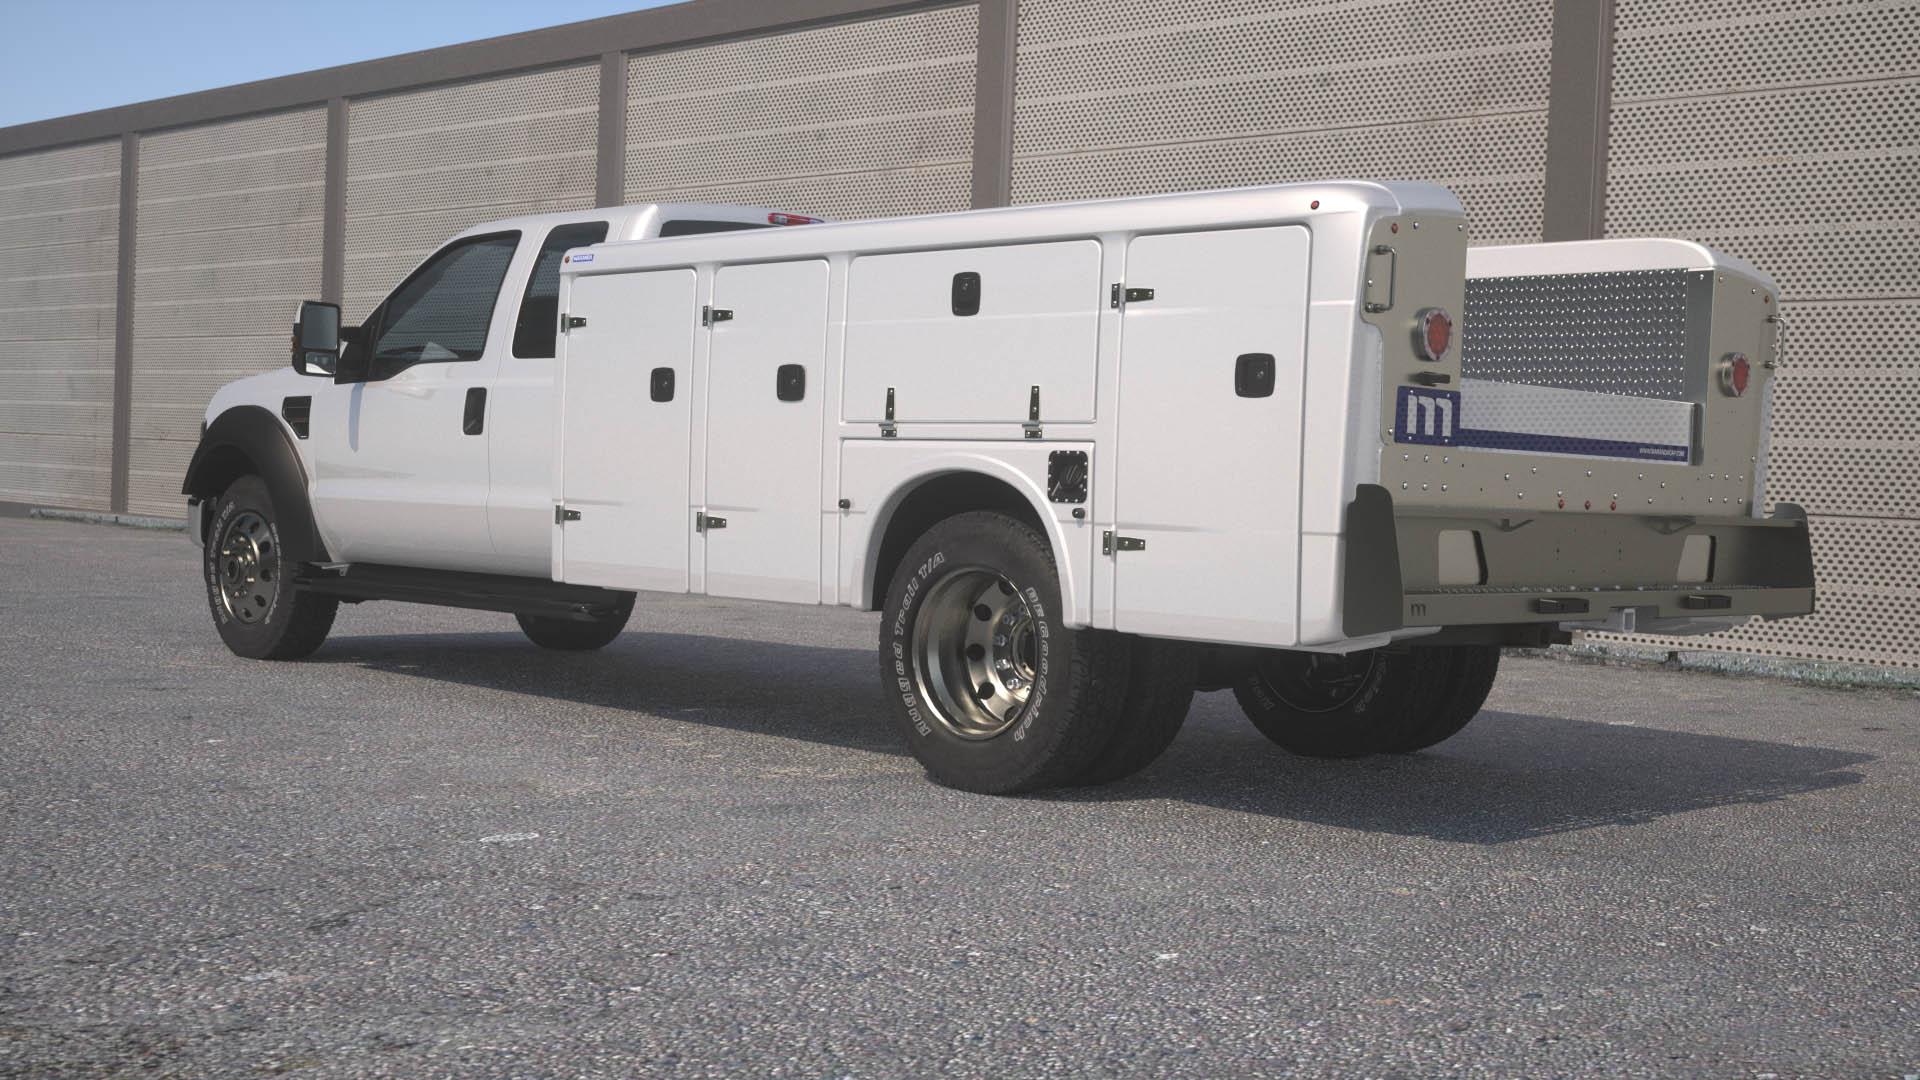 Maranda Composite Service Body Ca on Dodge Ram Building